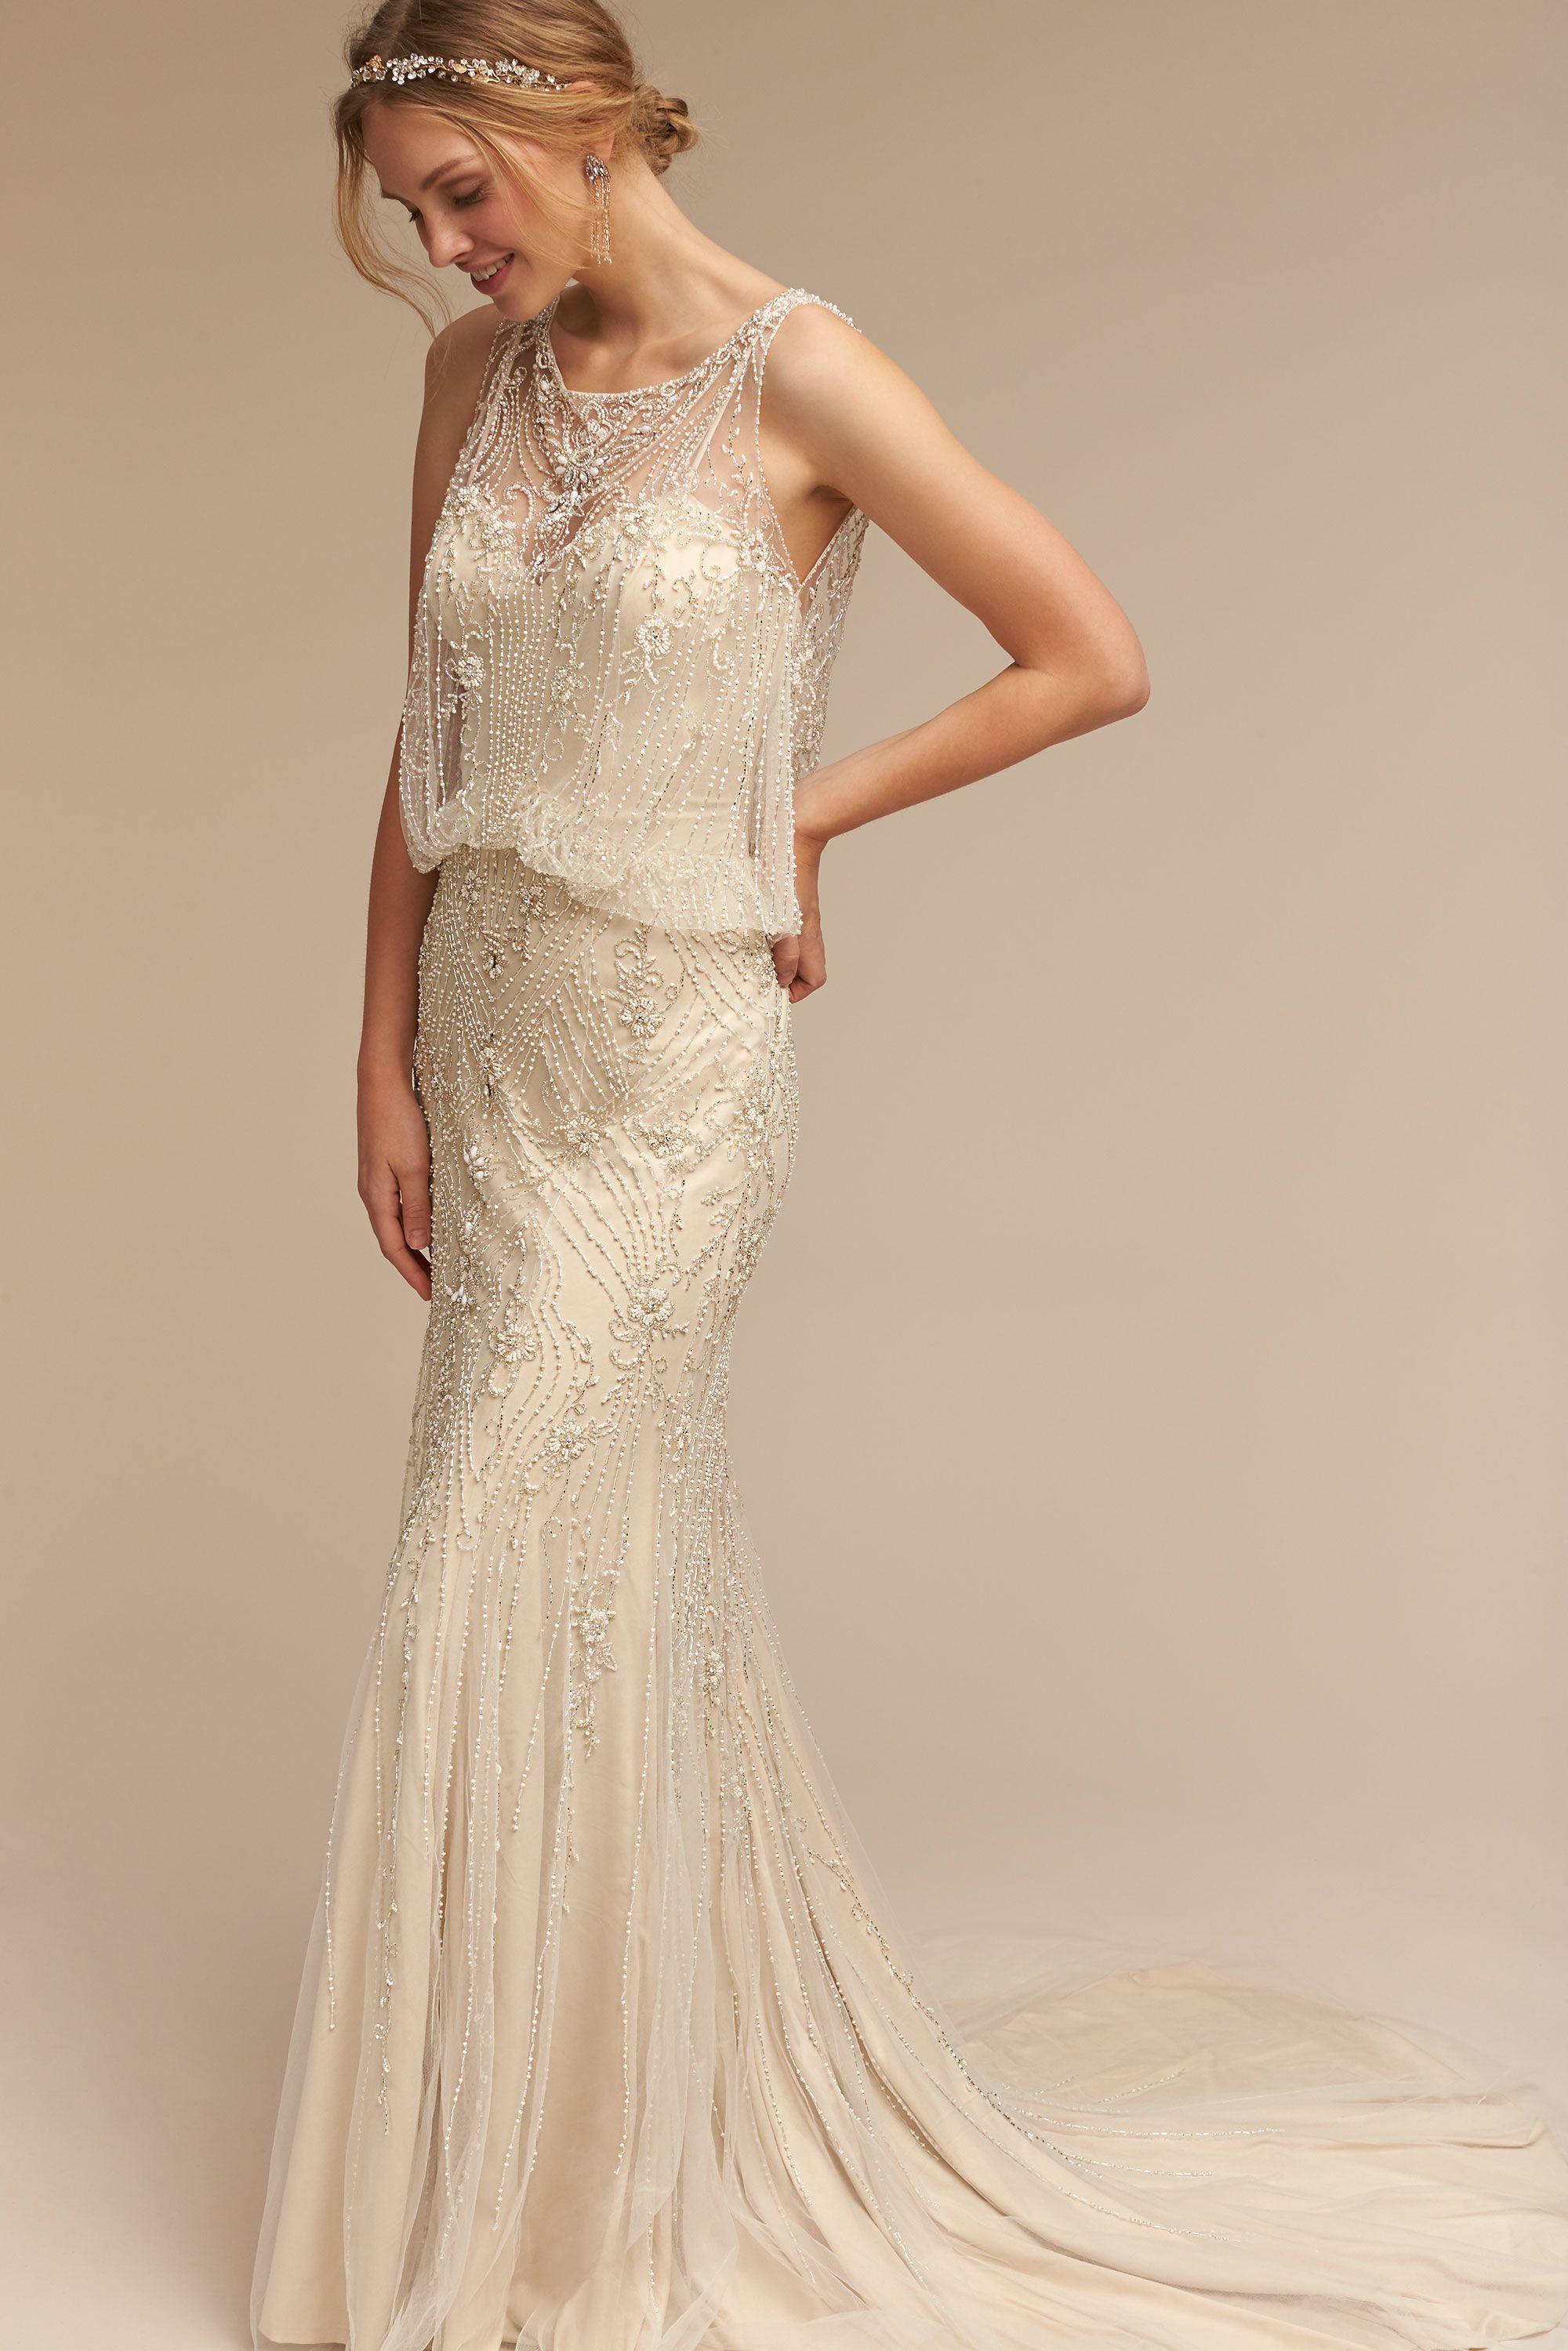 jacinda gown wedding gown Ivory champagne Jacinda Gown BHLDN